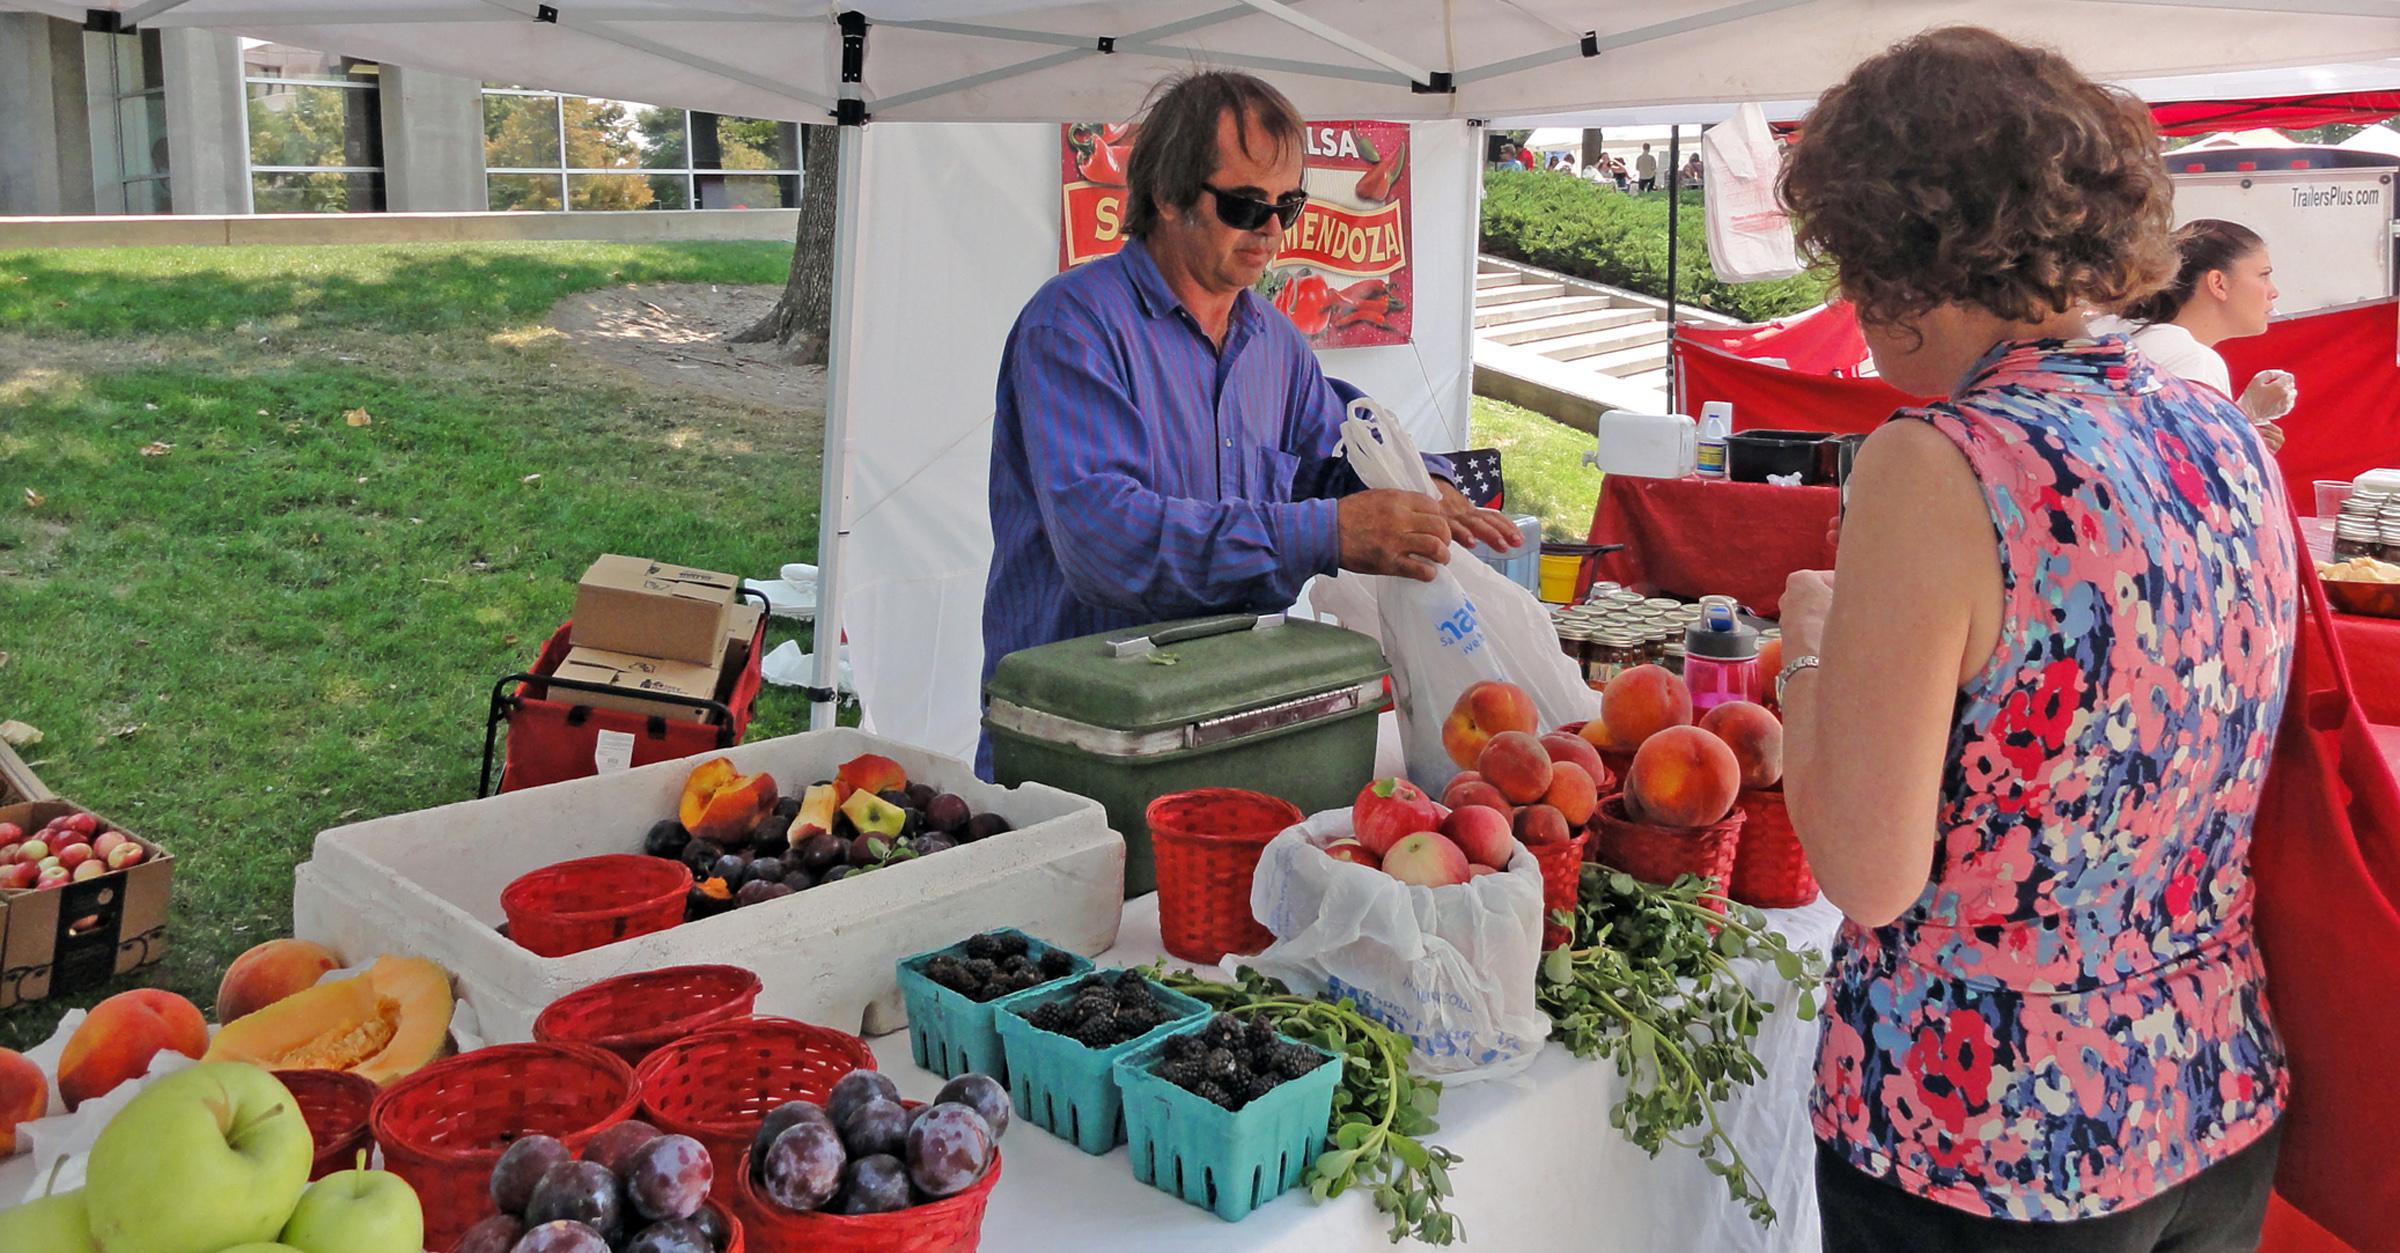 The University of Utah farmers market begins Thursday, Aug. 29, 10 a.m. – 2 p.m., and runs through Oct. 10.